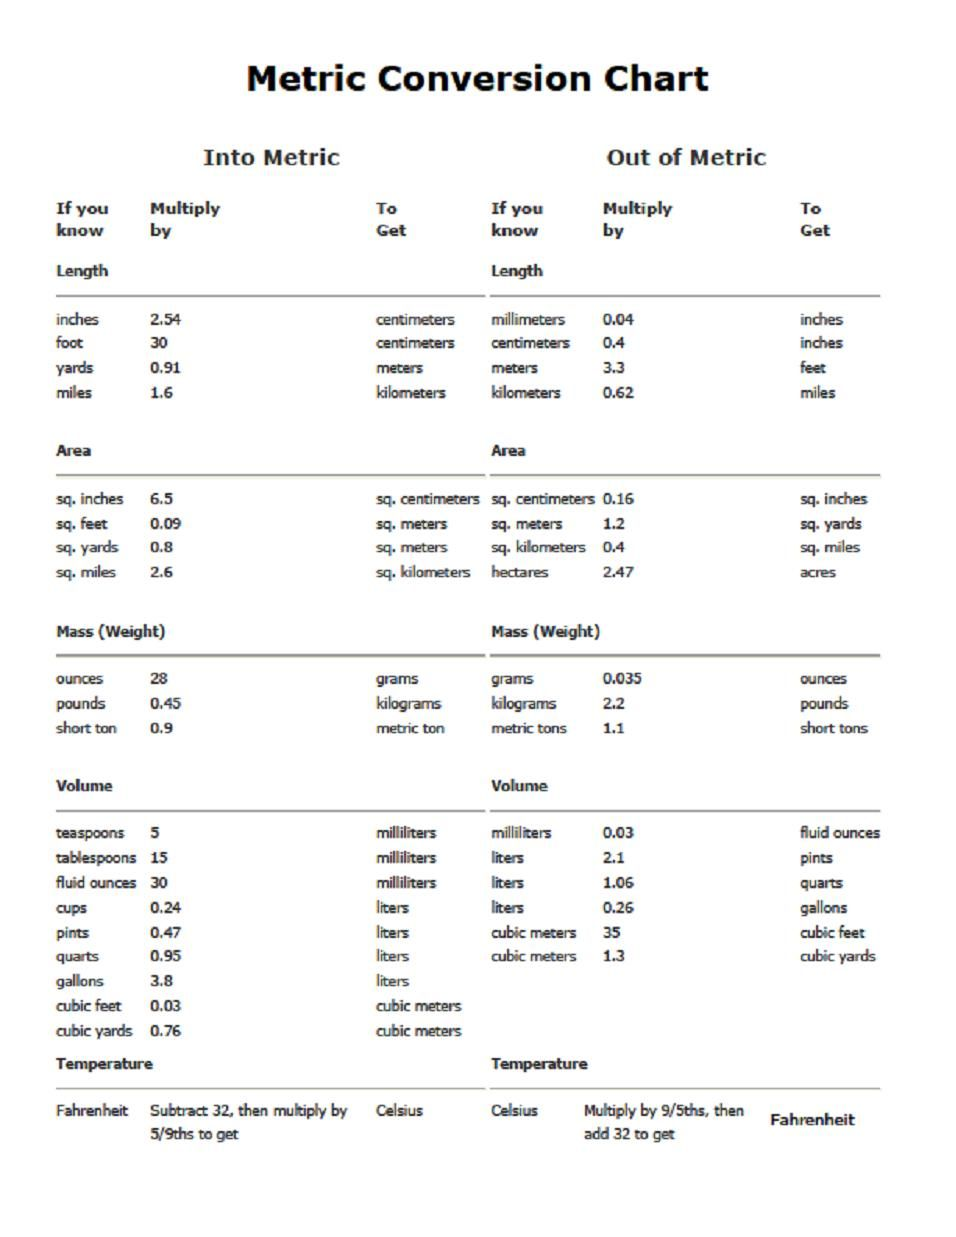 Metric Conversion Chart Metric Conversion Chart Metric Conversions Nursing Math